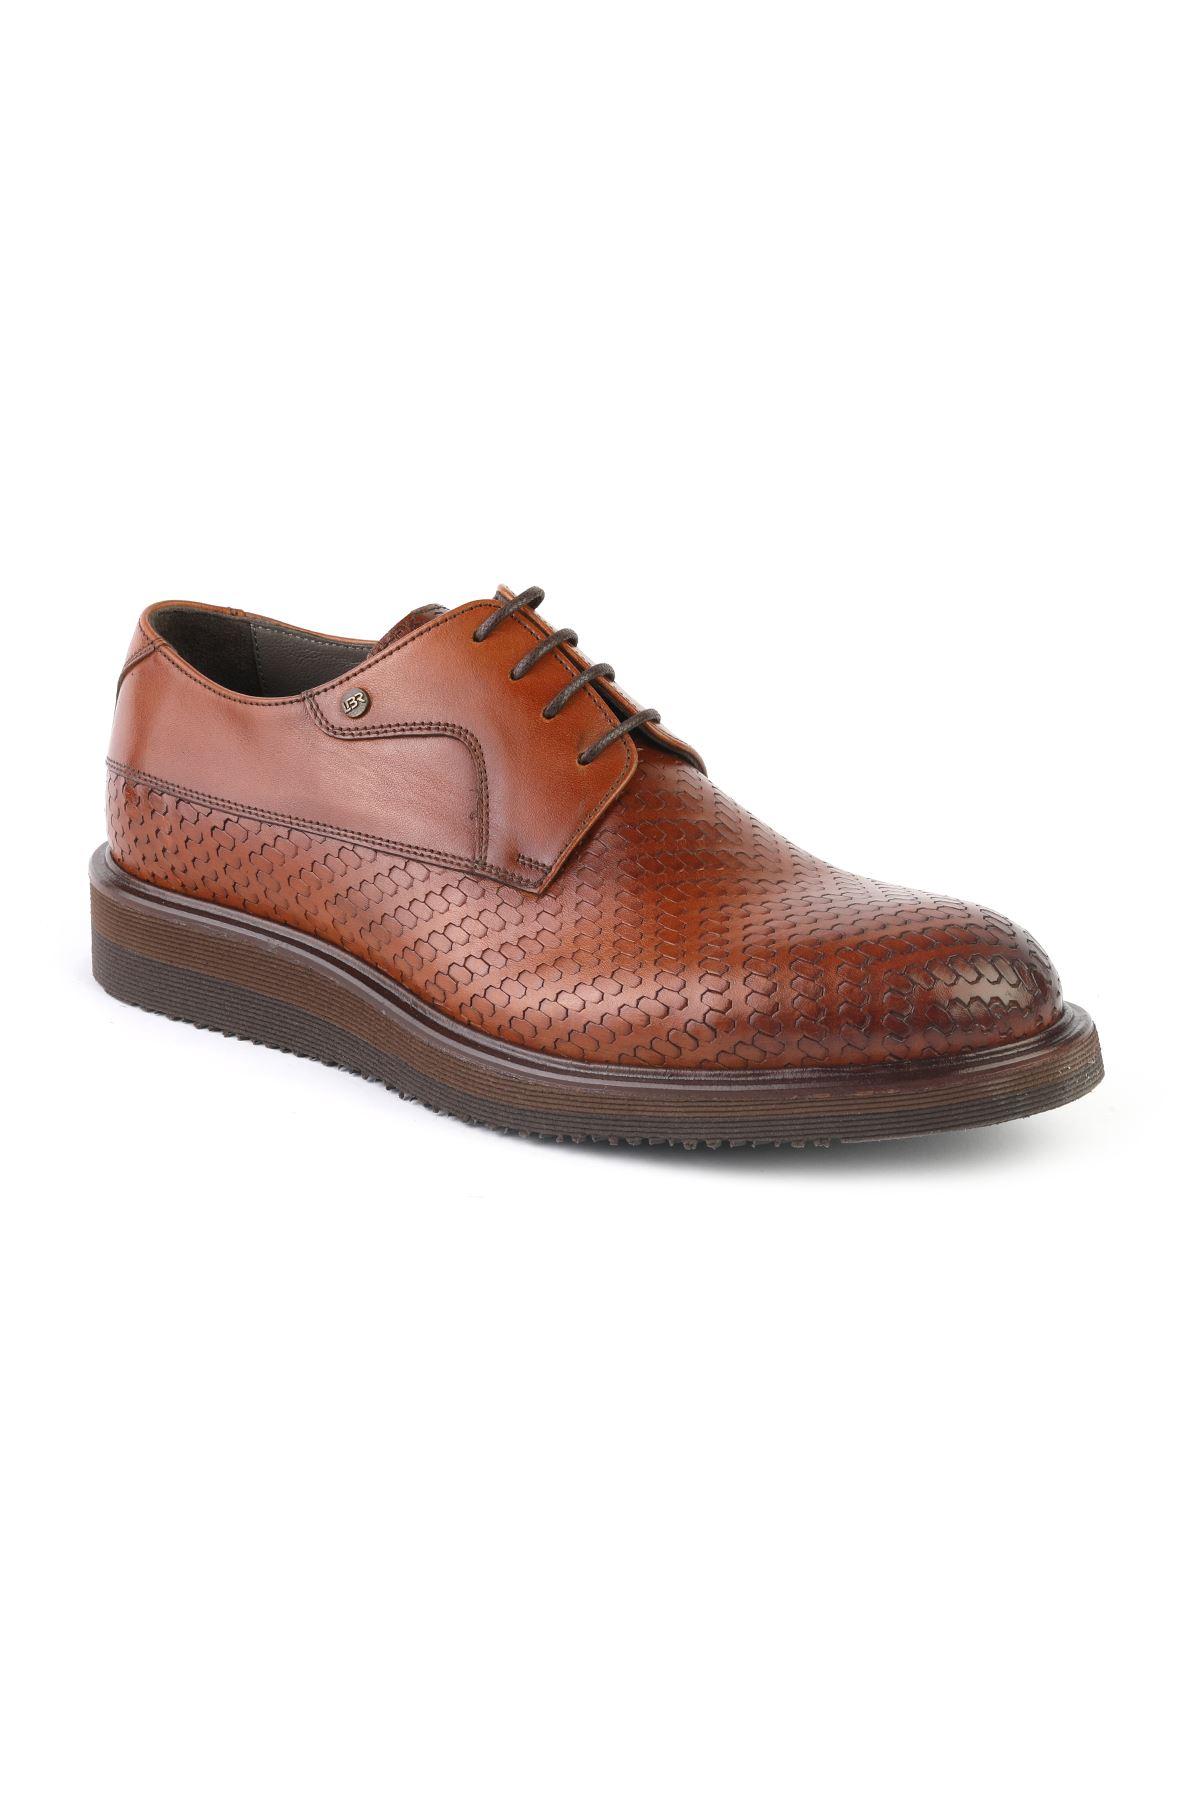 Libero T1190 Tan Casual Shoes